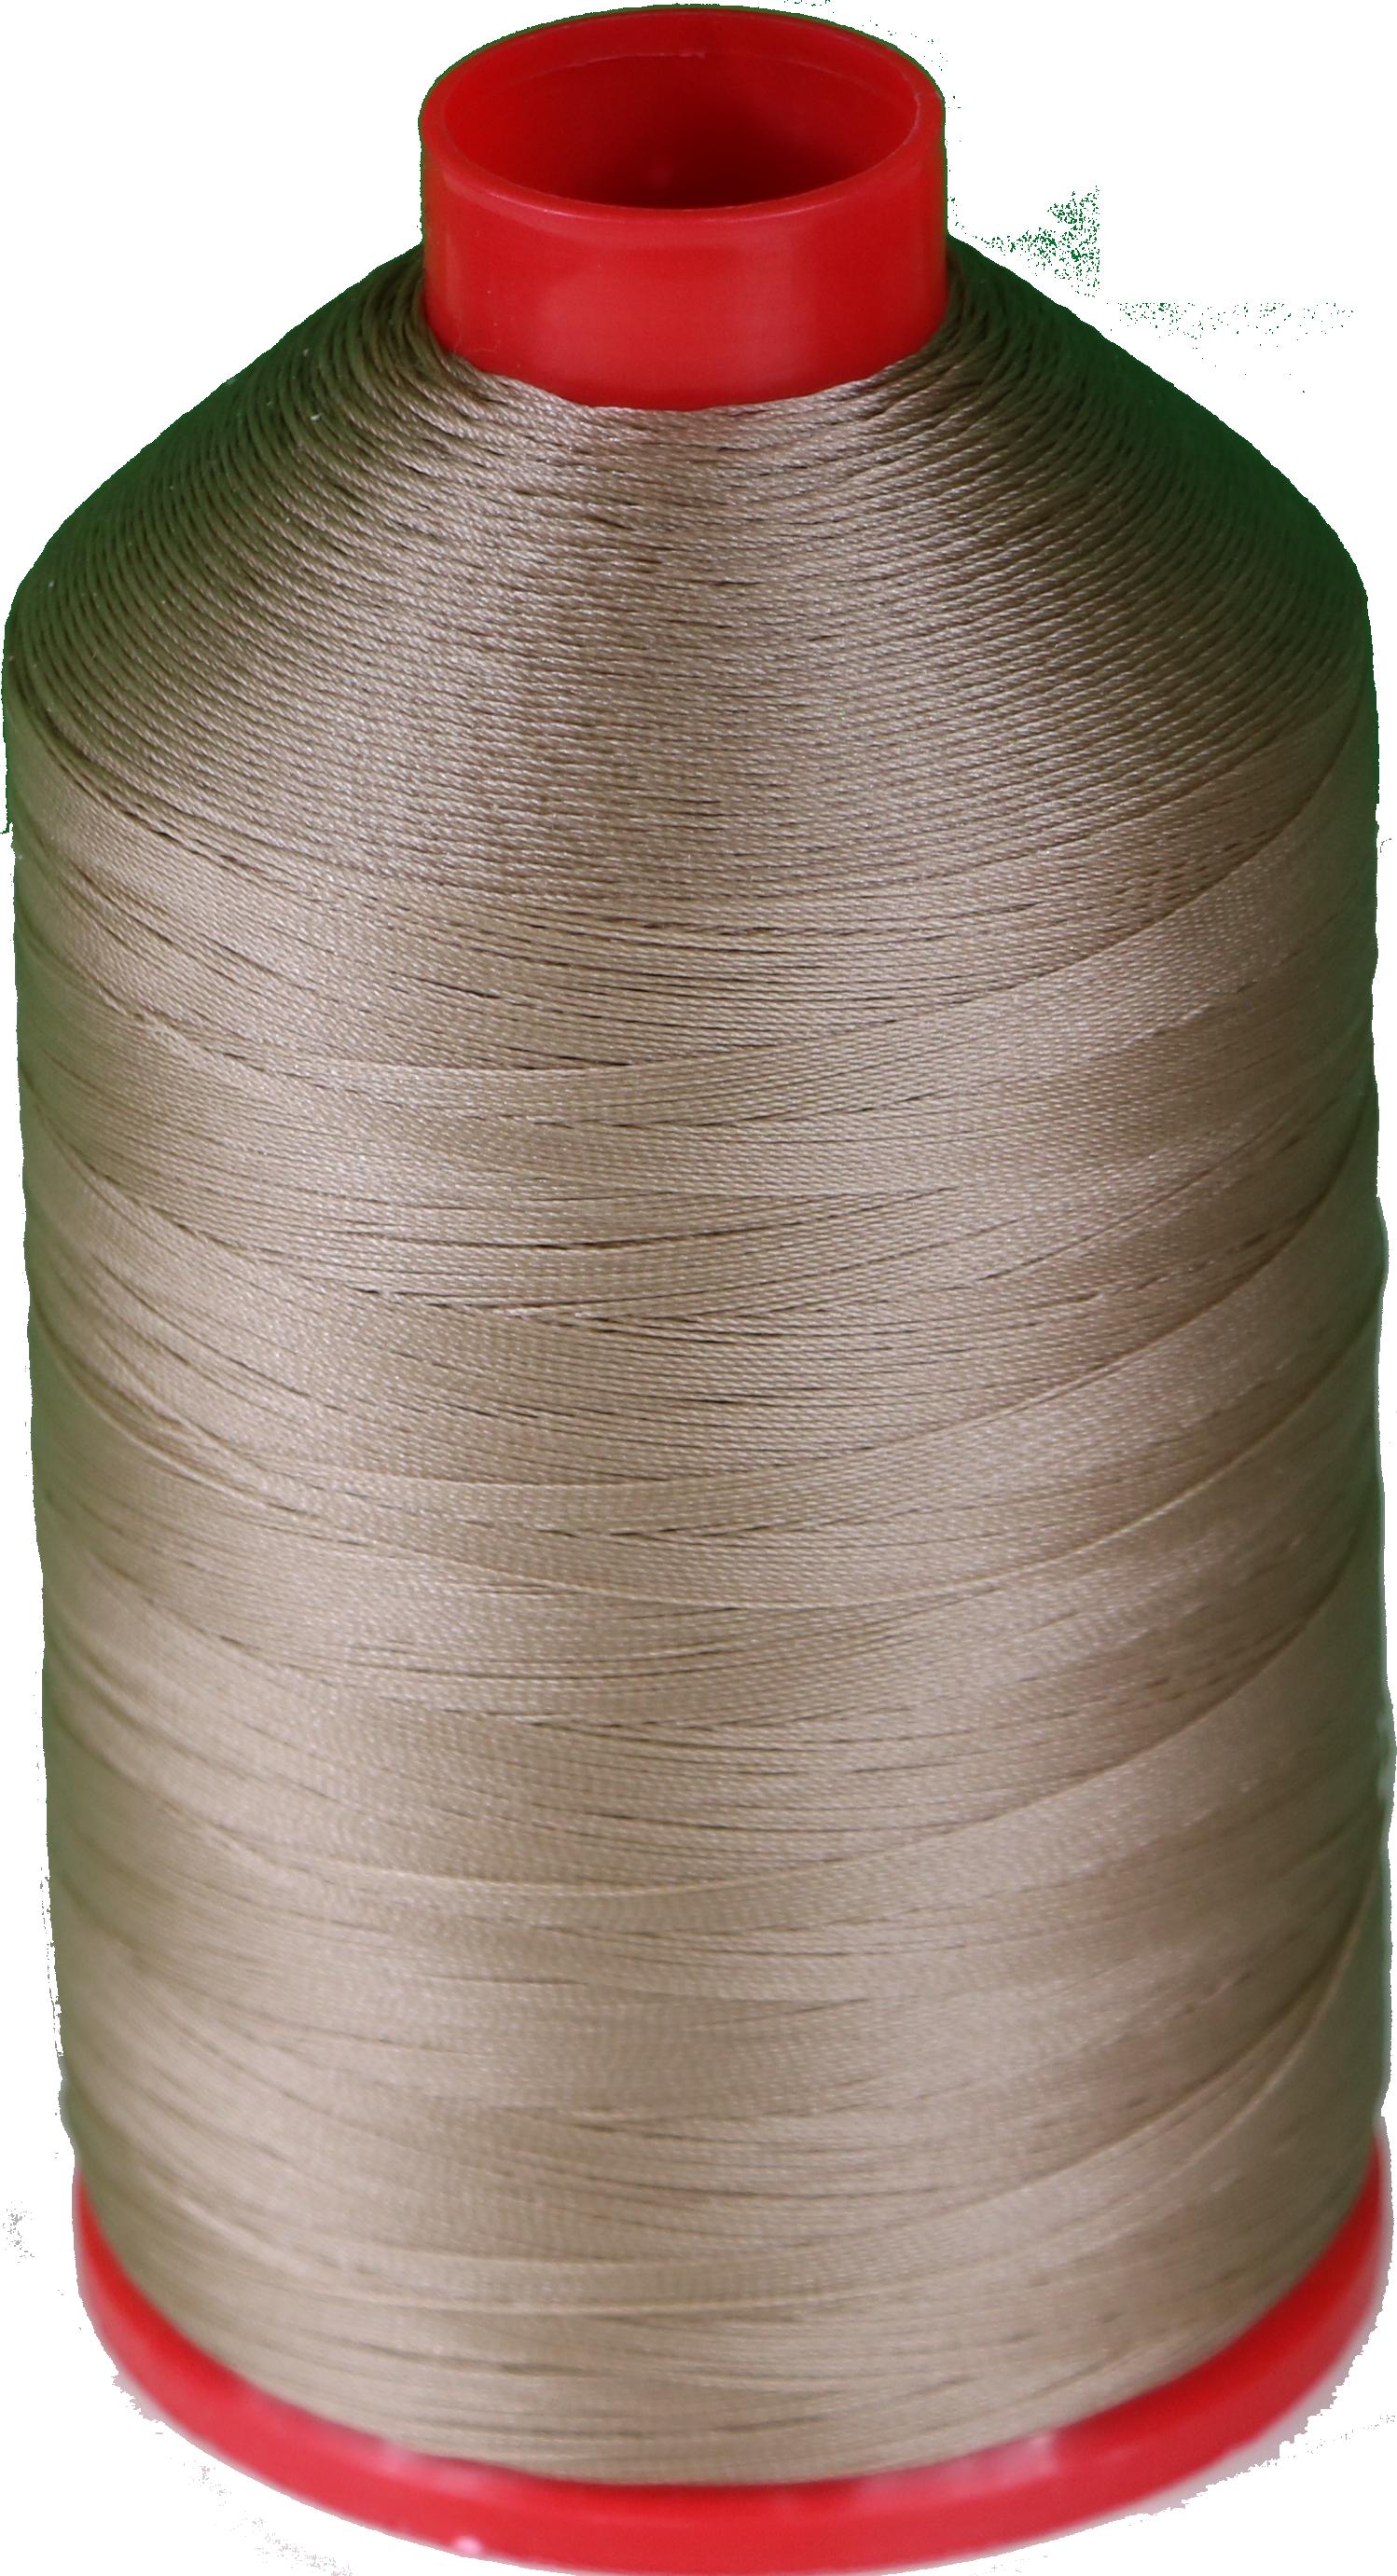 Tex 30, Color 4109 (grey brown) nylon thread 250G Spool